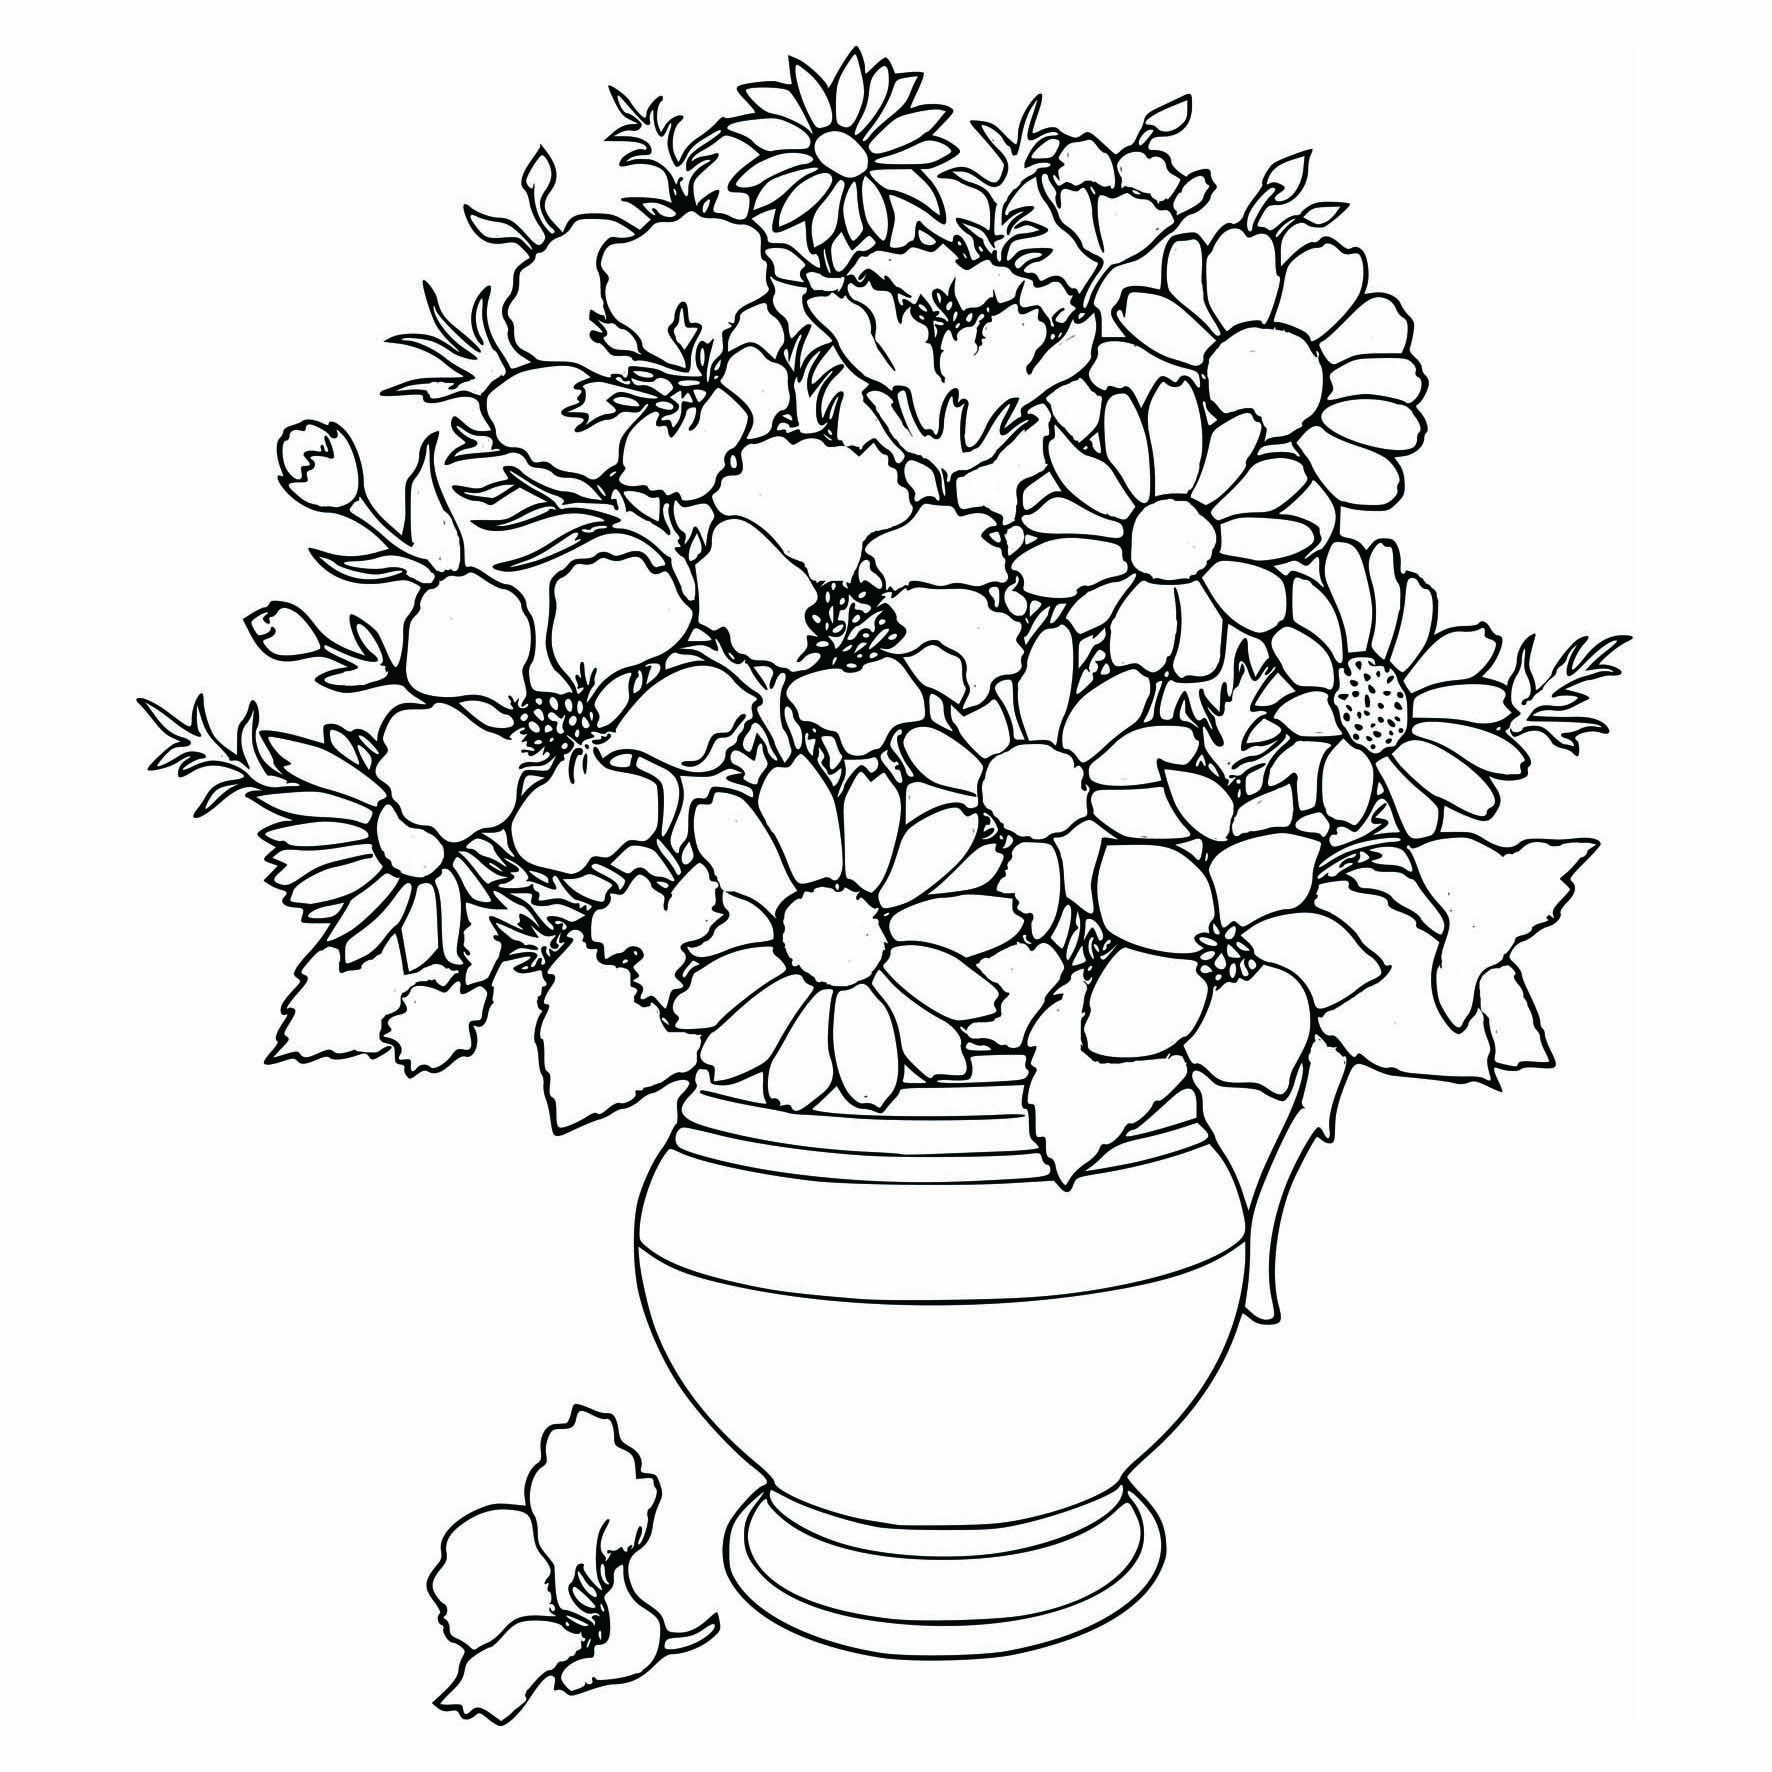 Dibujos De Flores Modernas Para Colorear Pintar E Imprimir L Dibujos Flores Para Colorear Paginas Para Colorear De Flores Paginas Para Colorear Para Imprimir